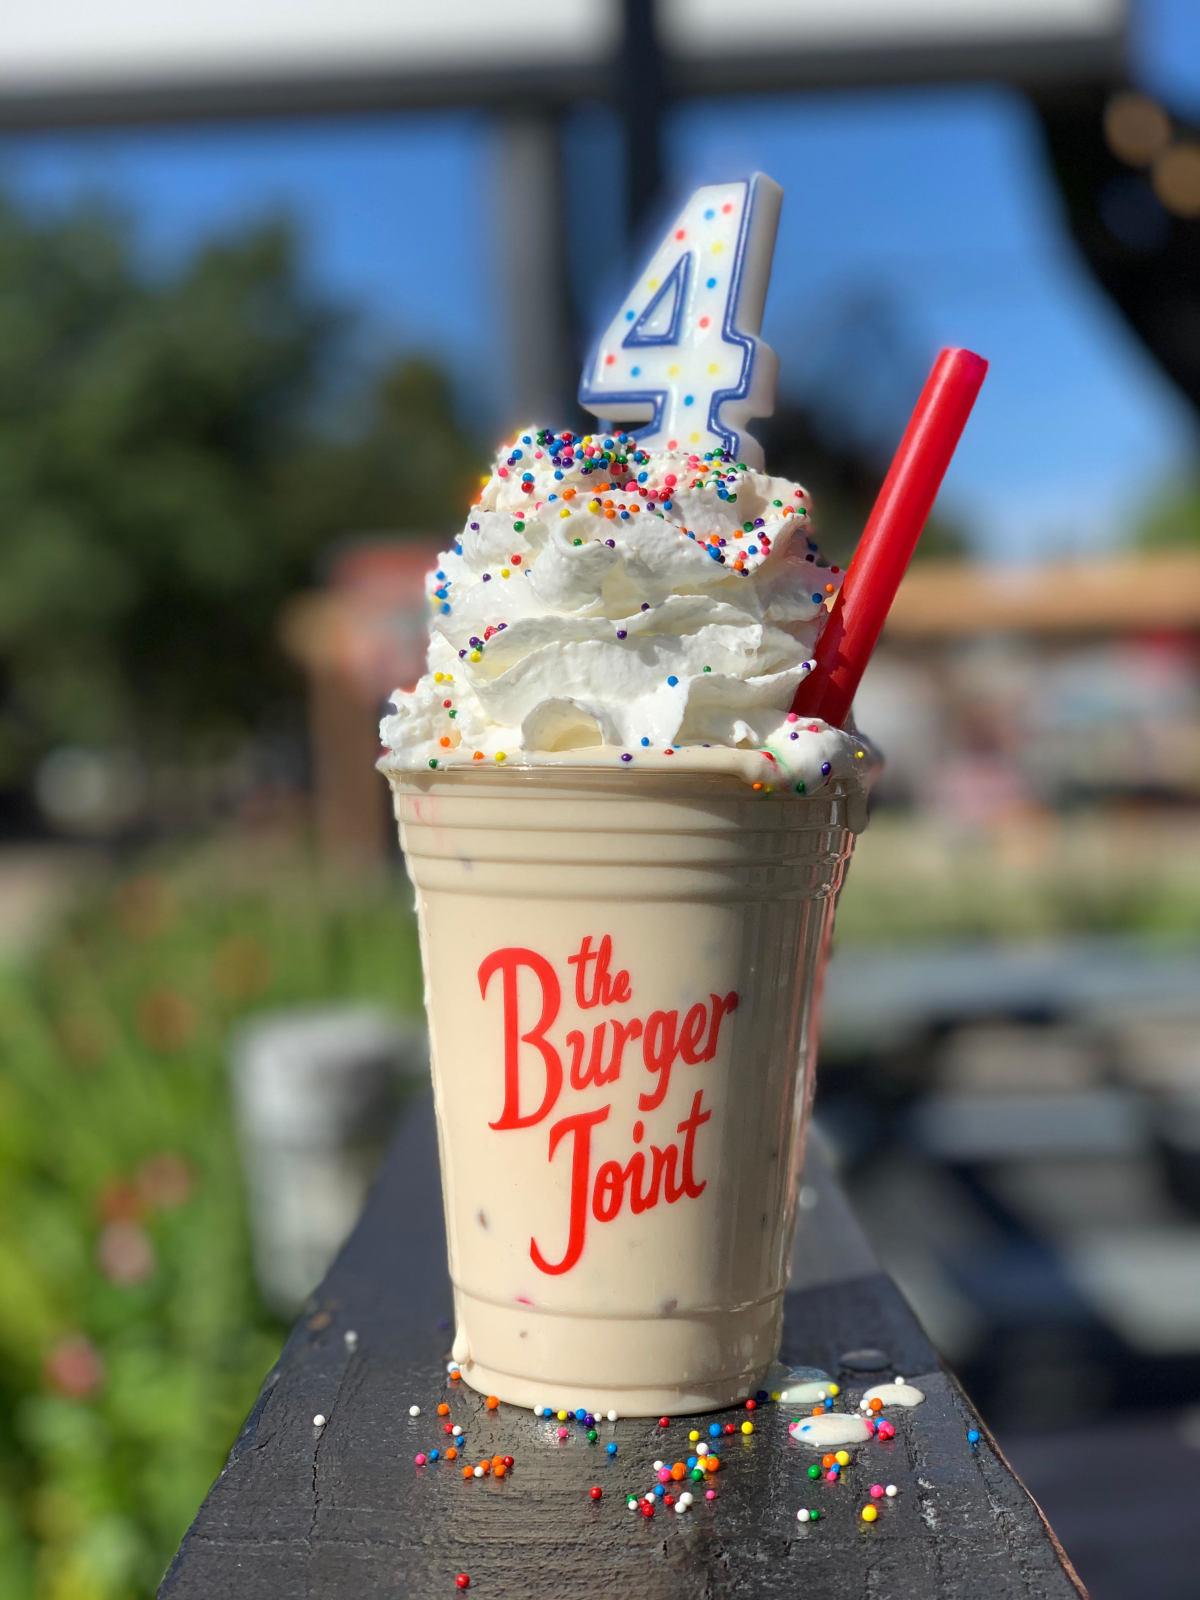 Burger Joint Cookie Butter milkshake